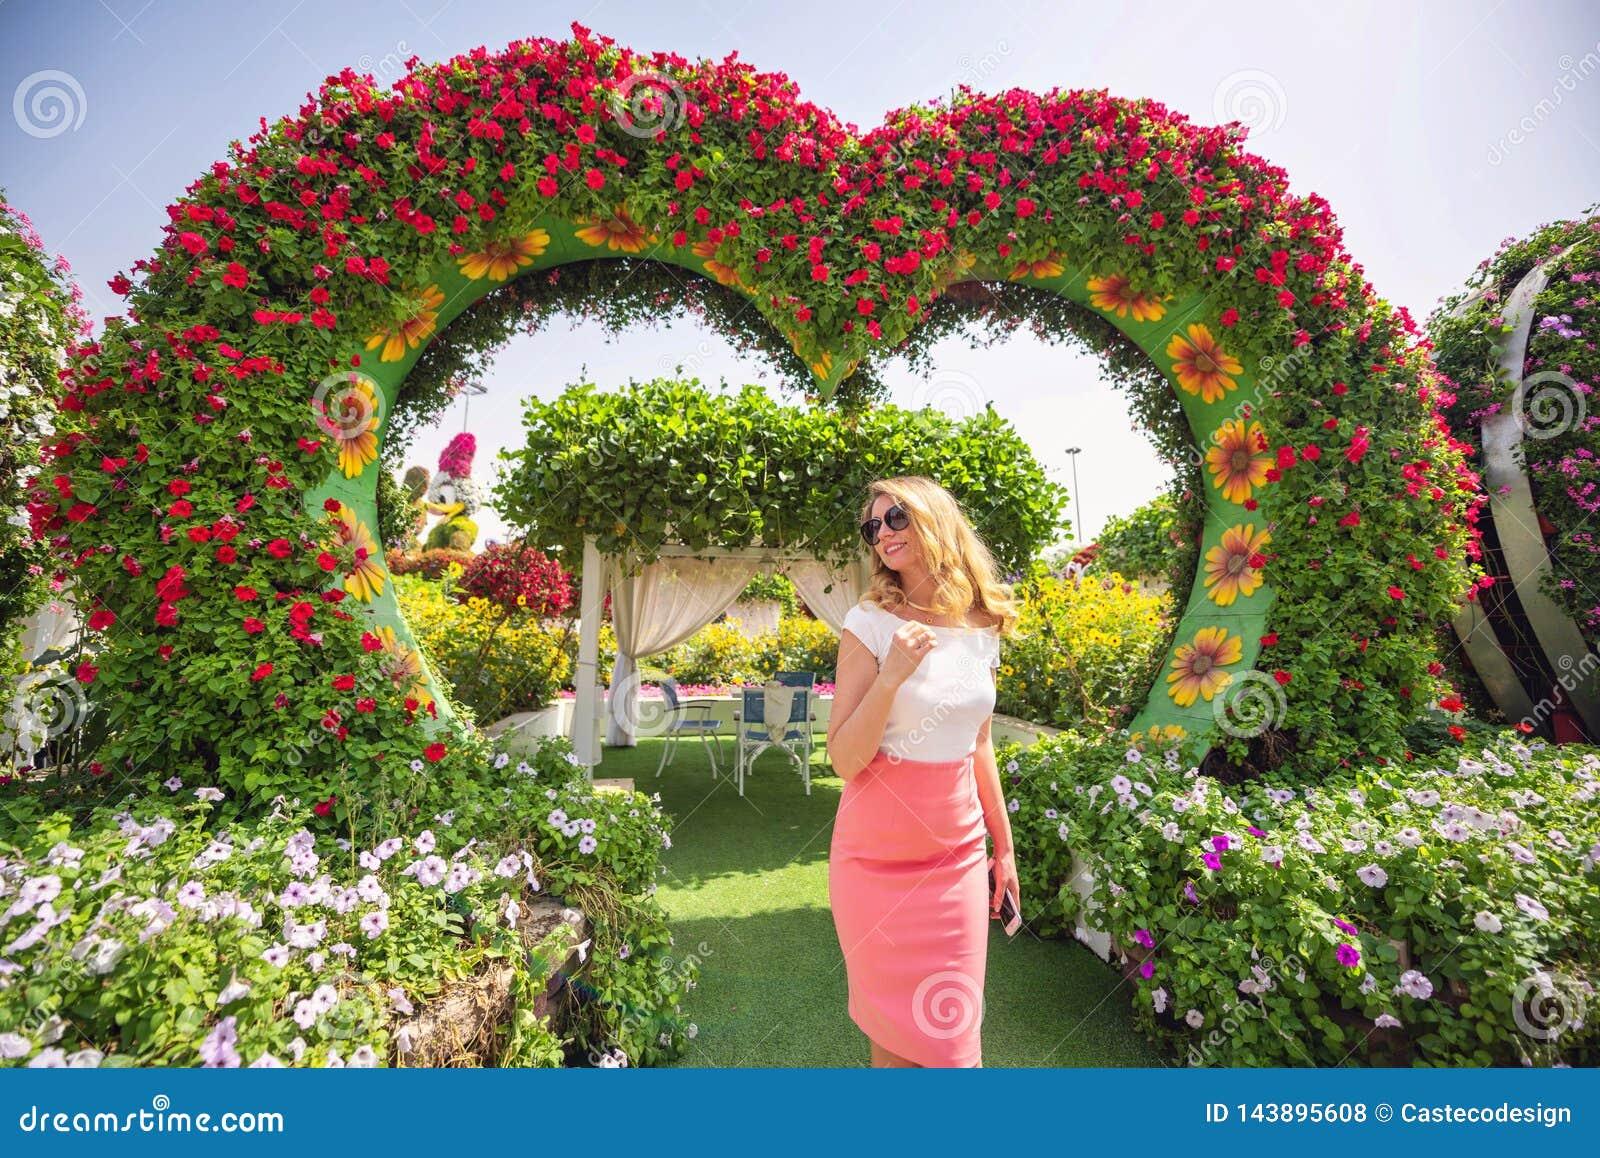 Woman In Dubai Garden Portrait Sunny Day Beautiful Flowers